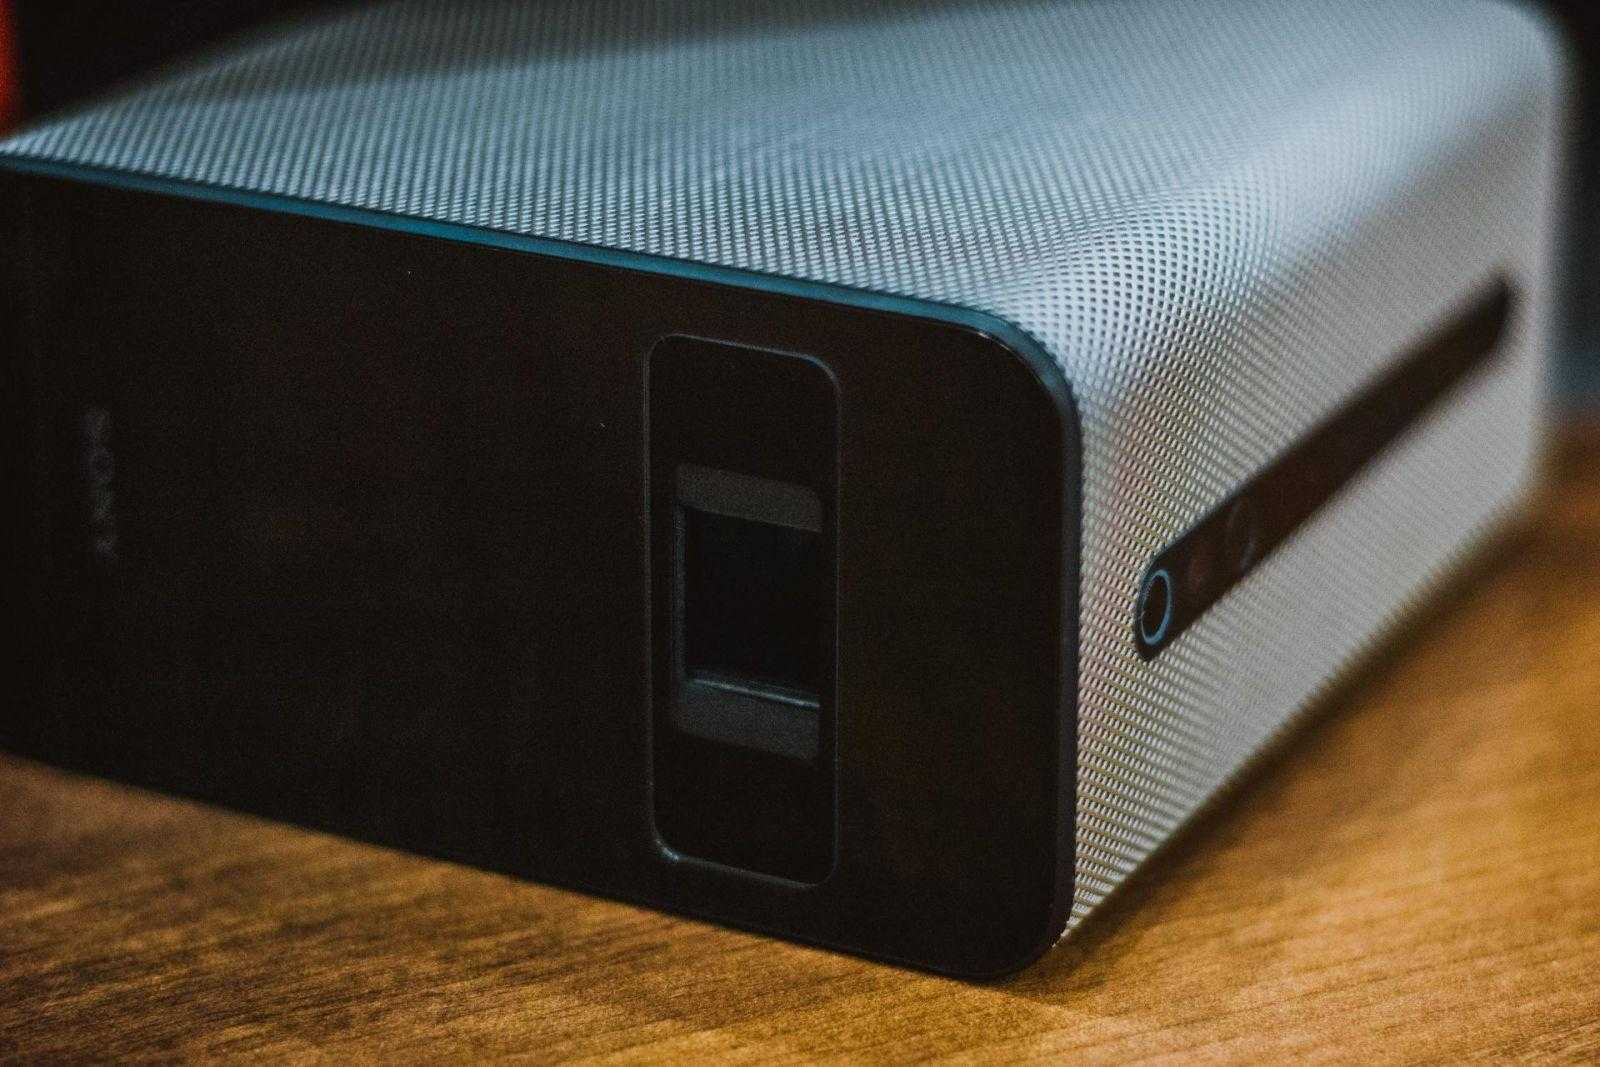 DSC 5924 - Обзор проектора Sony Xperia Touch. Потрогай виртуальность